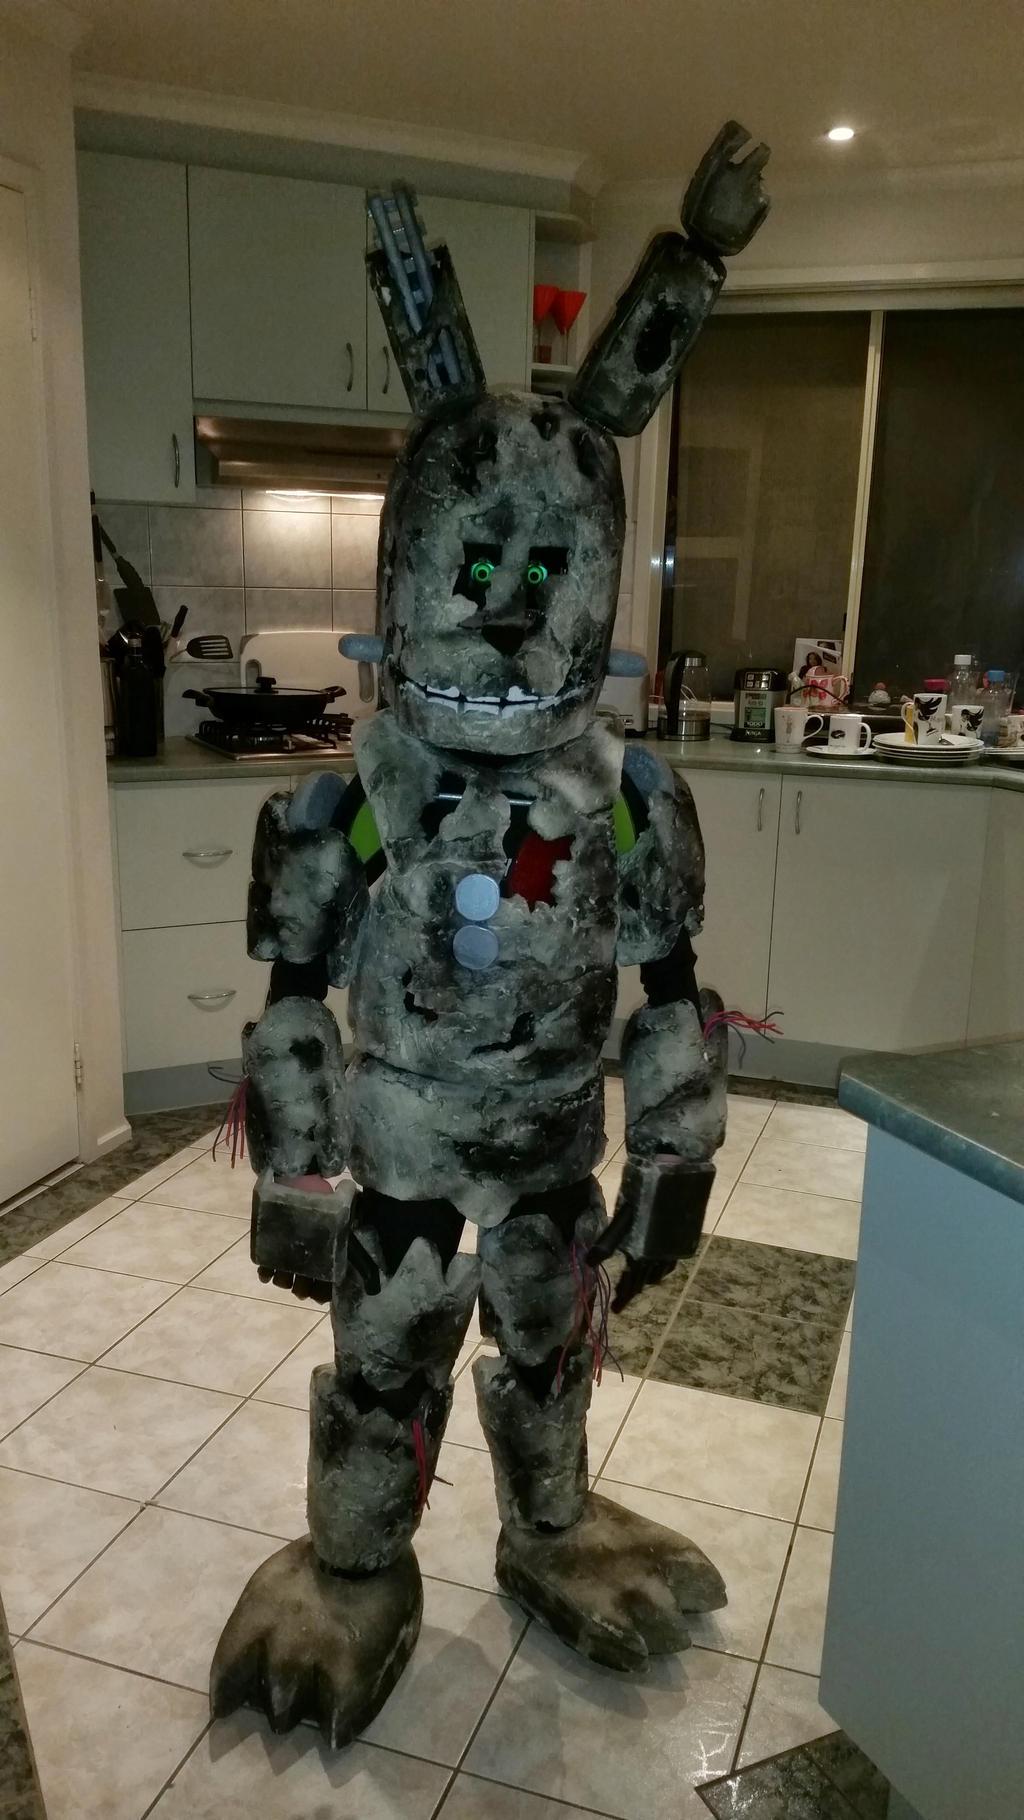 Springtrap fnaf cosplay for halloween 2015 by capncomic on deviantart